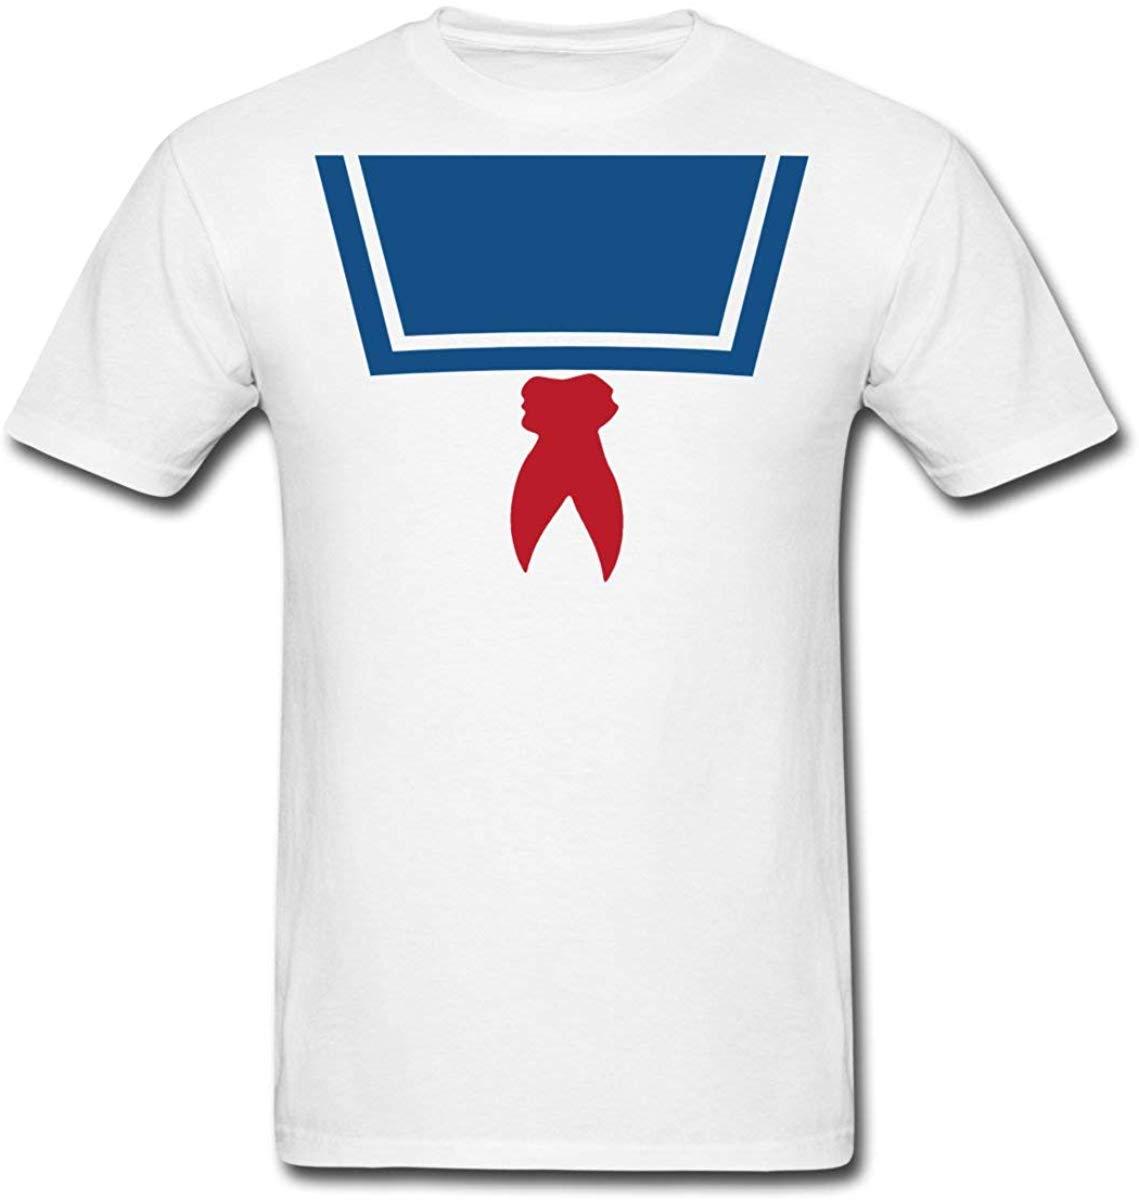 FGHFG Stay Puft Marshmallow hombre traje de hombre Camiseta Unisex hombres mujeres camiseta